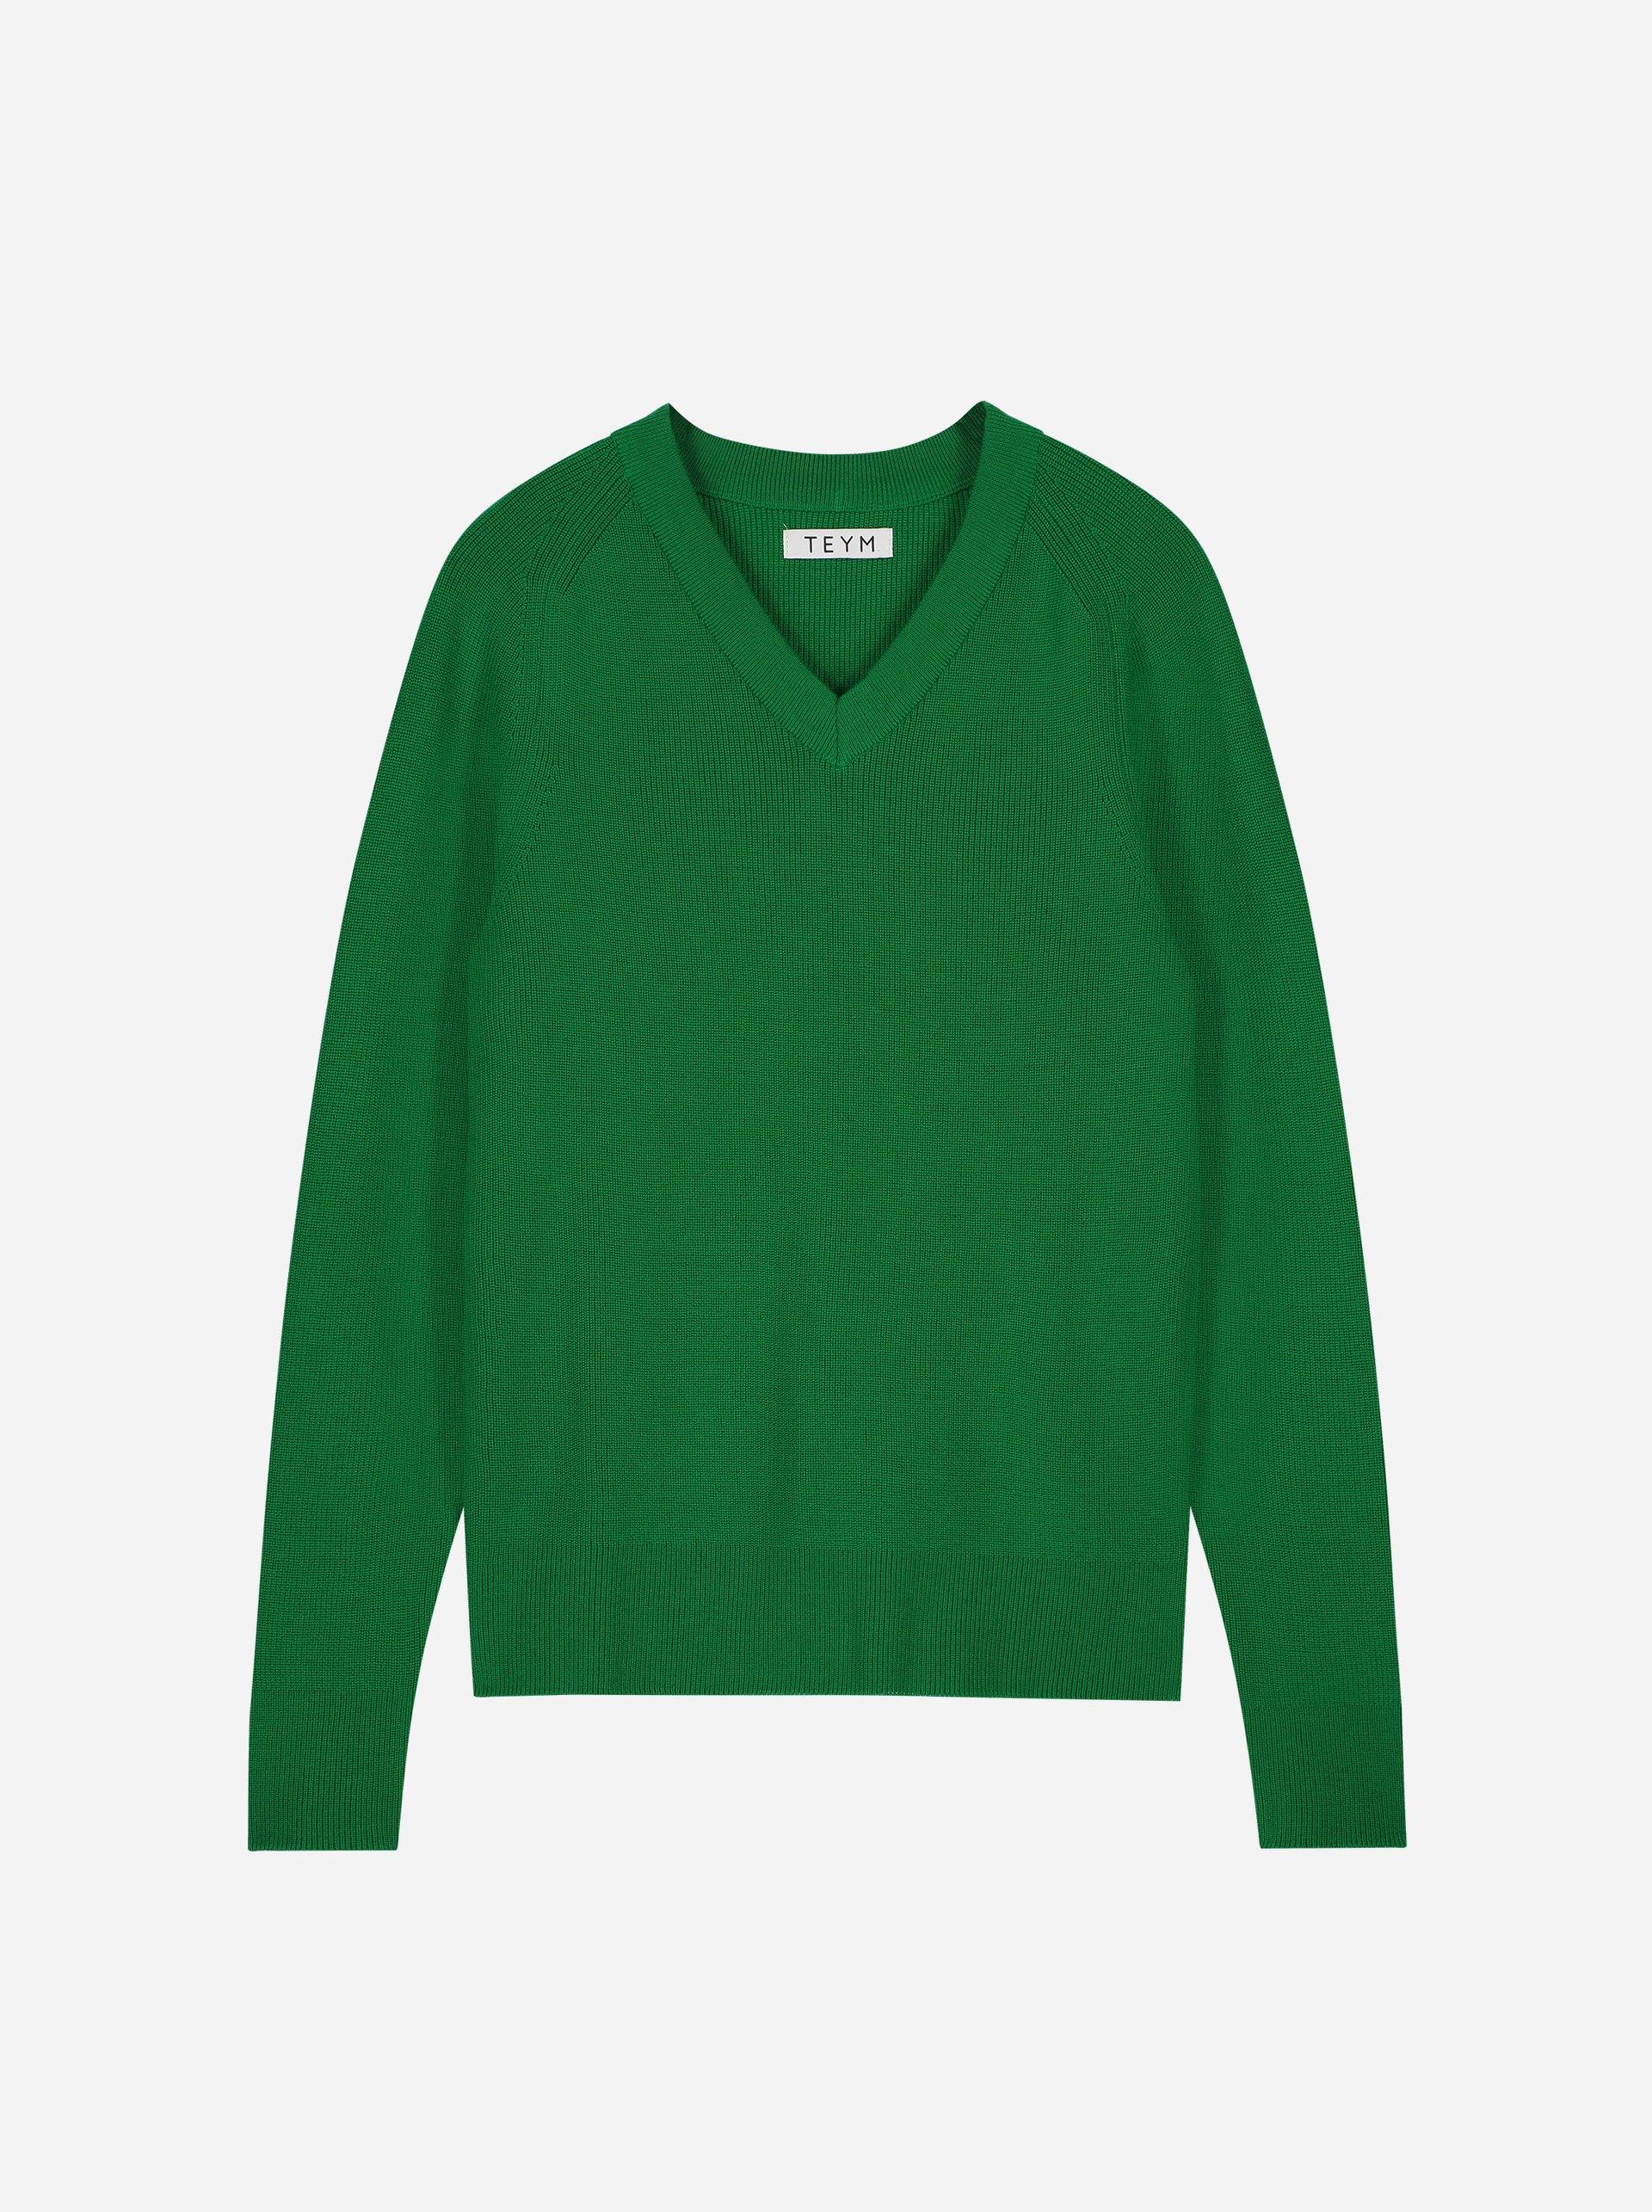 Teym - V-Neck - The Merino Sweater - Men - Bright Green - 4